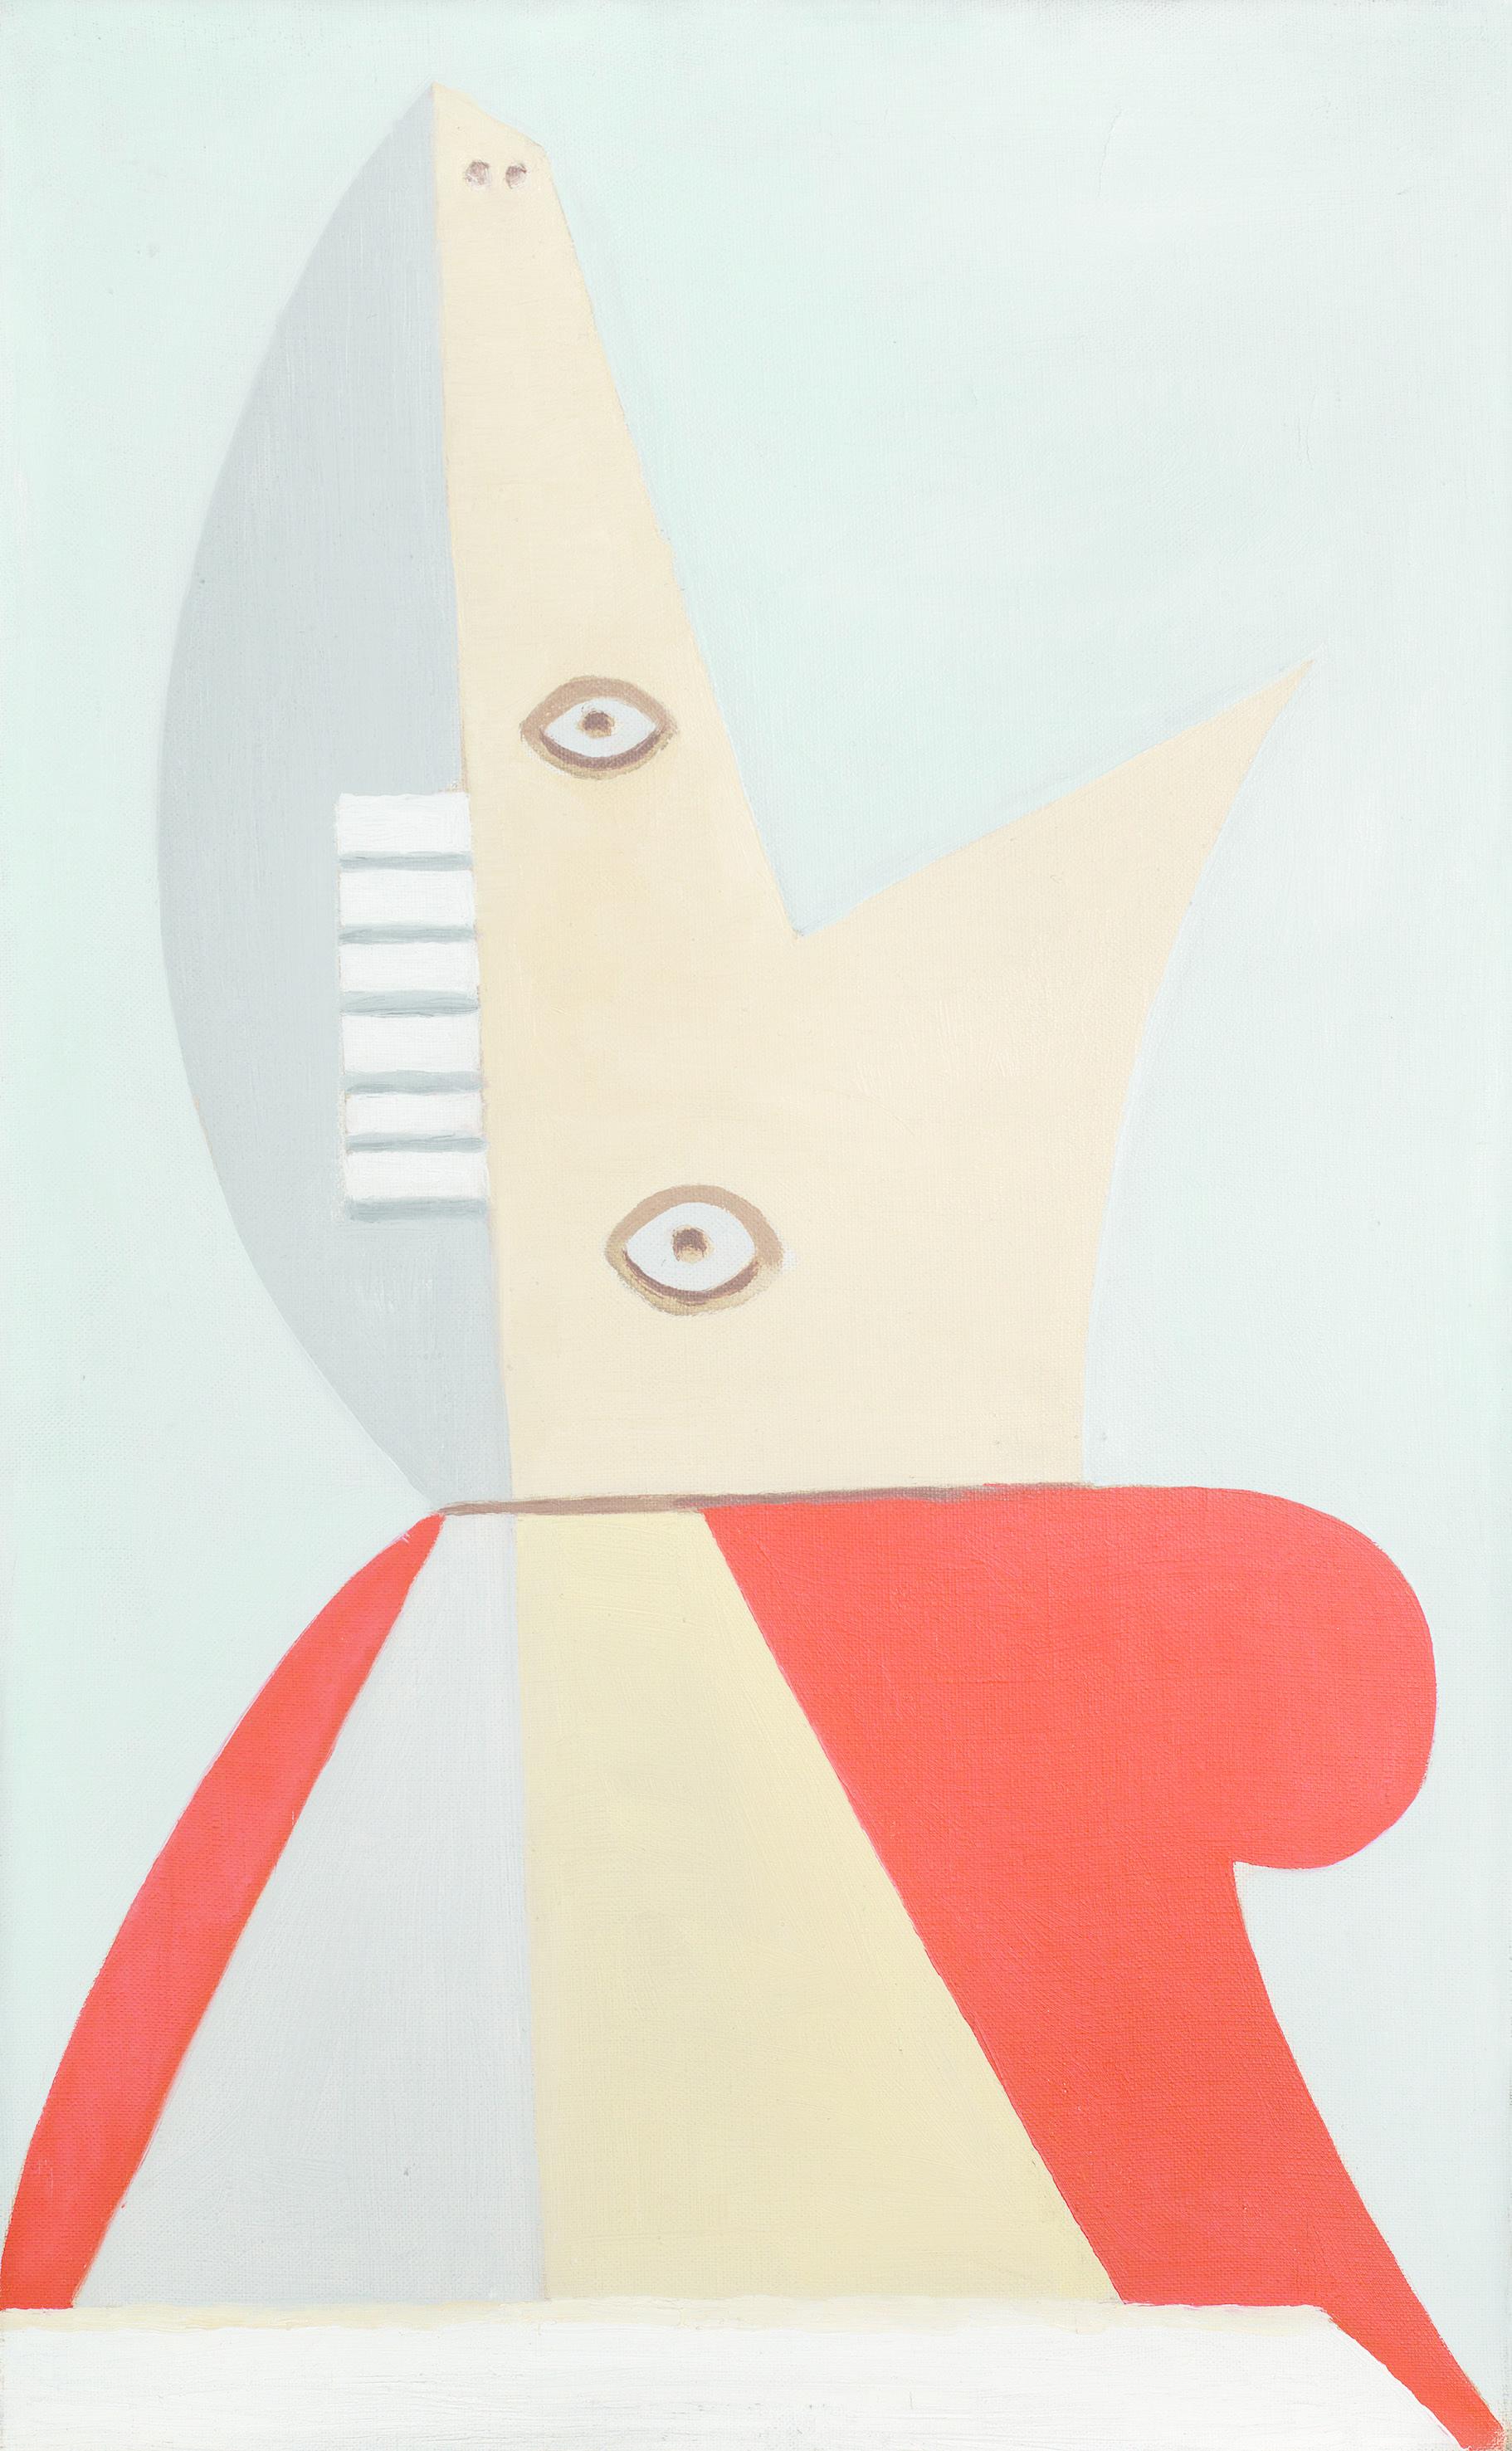 Kandinsky, Arp, Picasso ... Klee & Friends